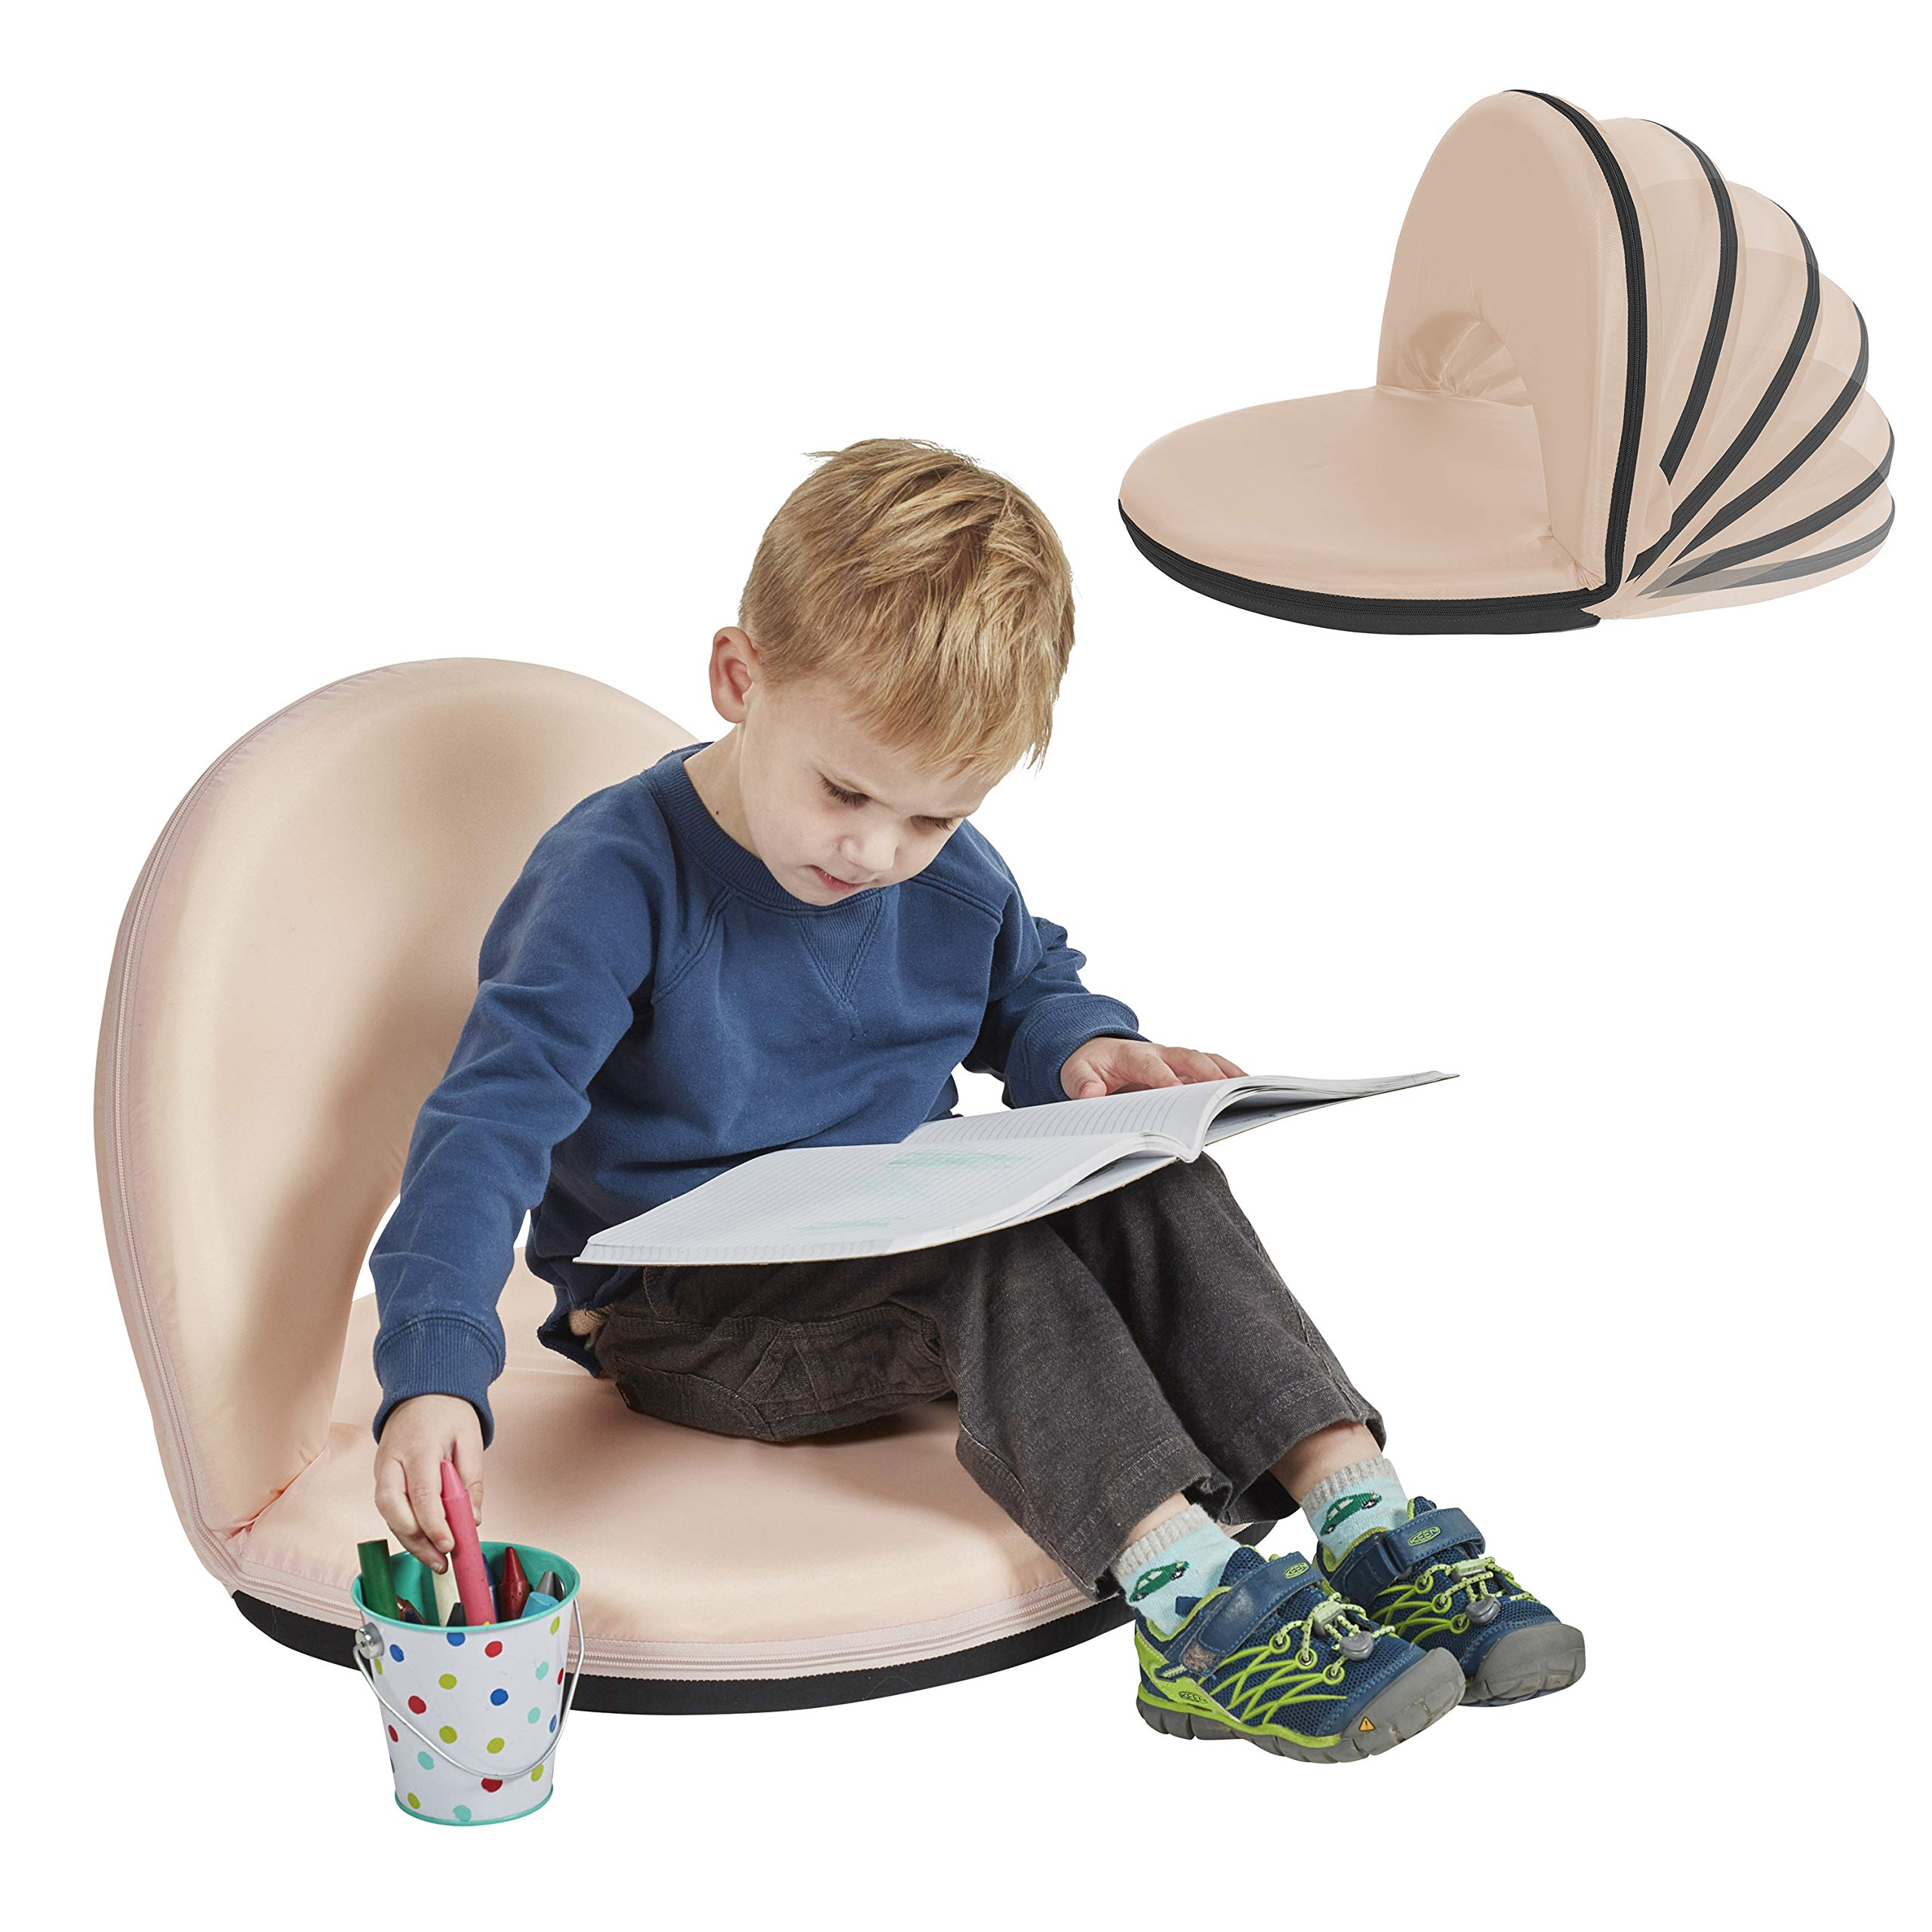 Ecr4kids Spectator Floor Chair With